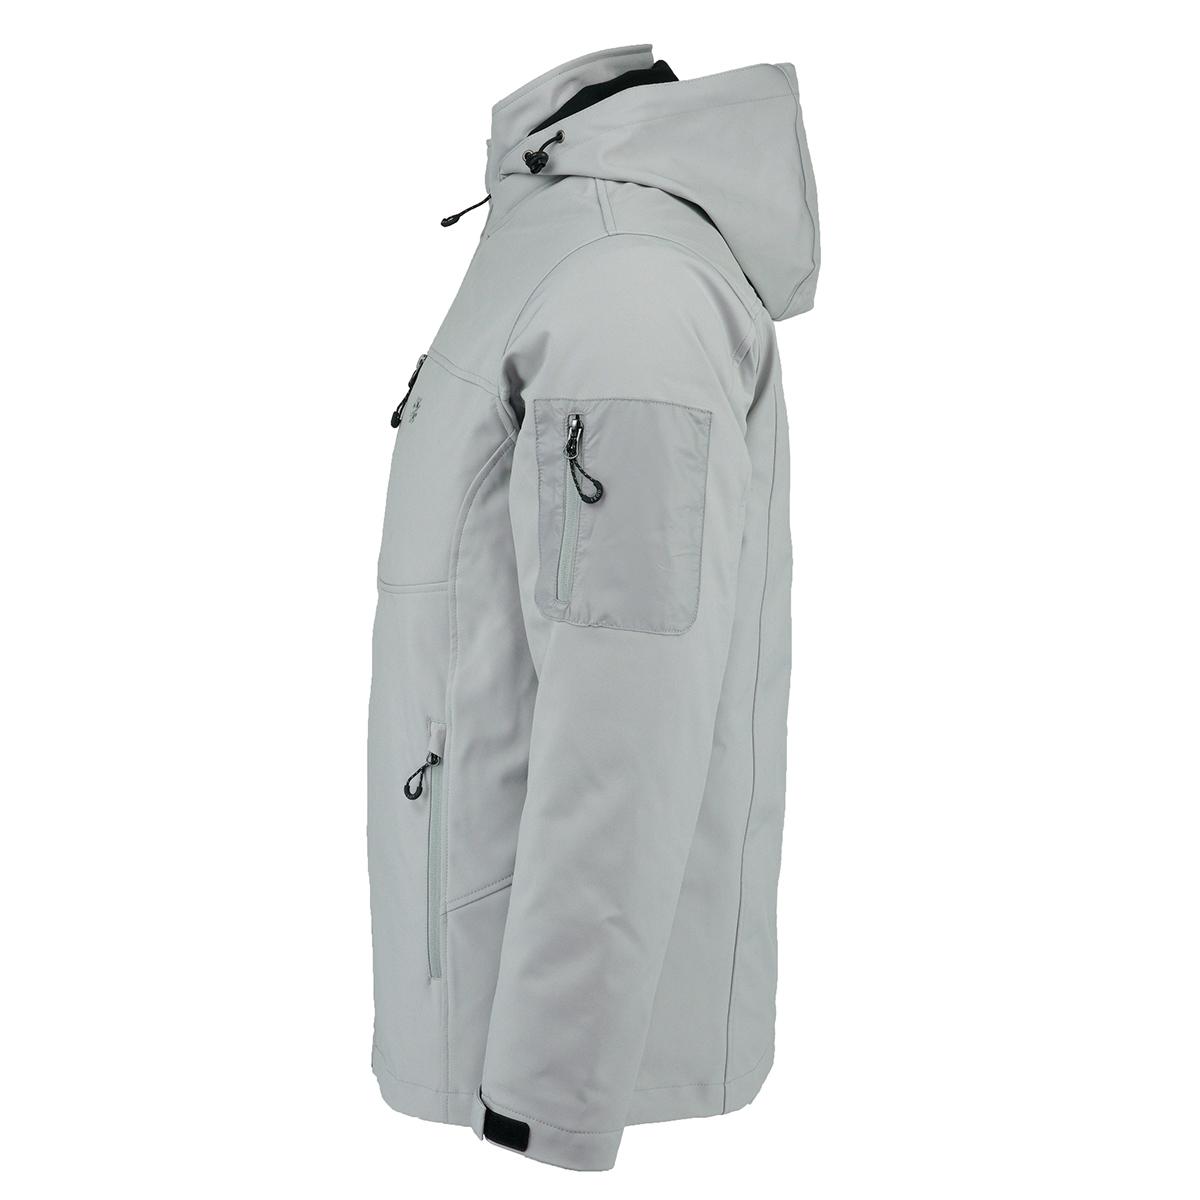 IZOD-Men-039-s-3-in-1-Soft-Shell-Systems-Jacket thumbnail 15